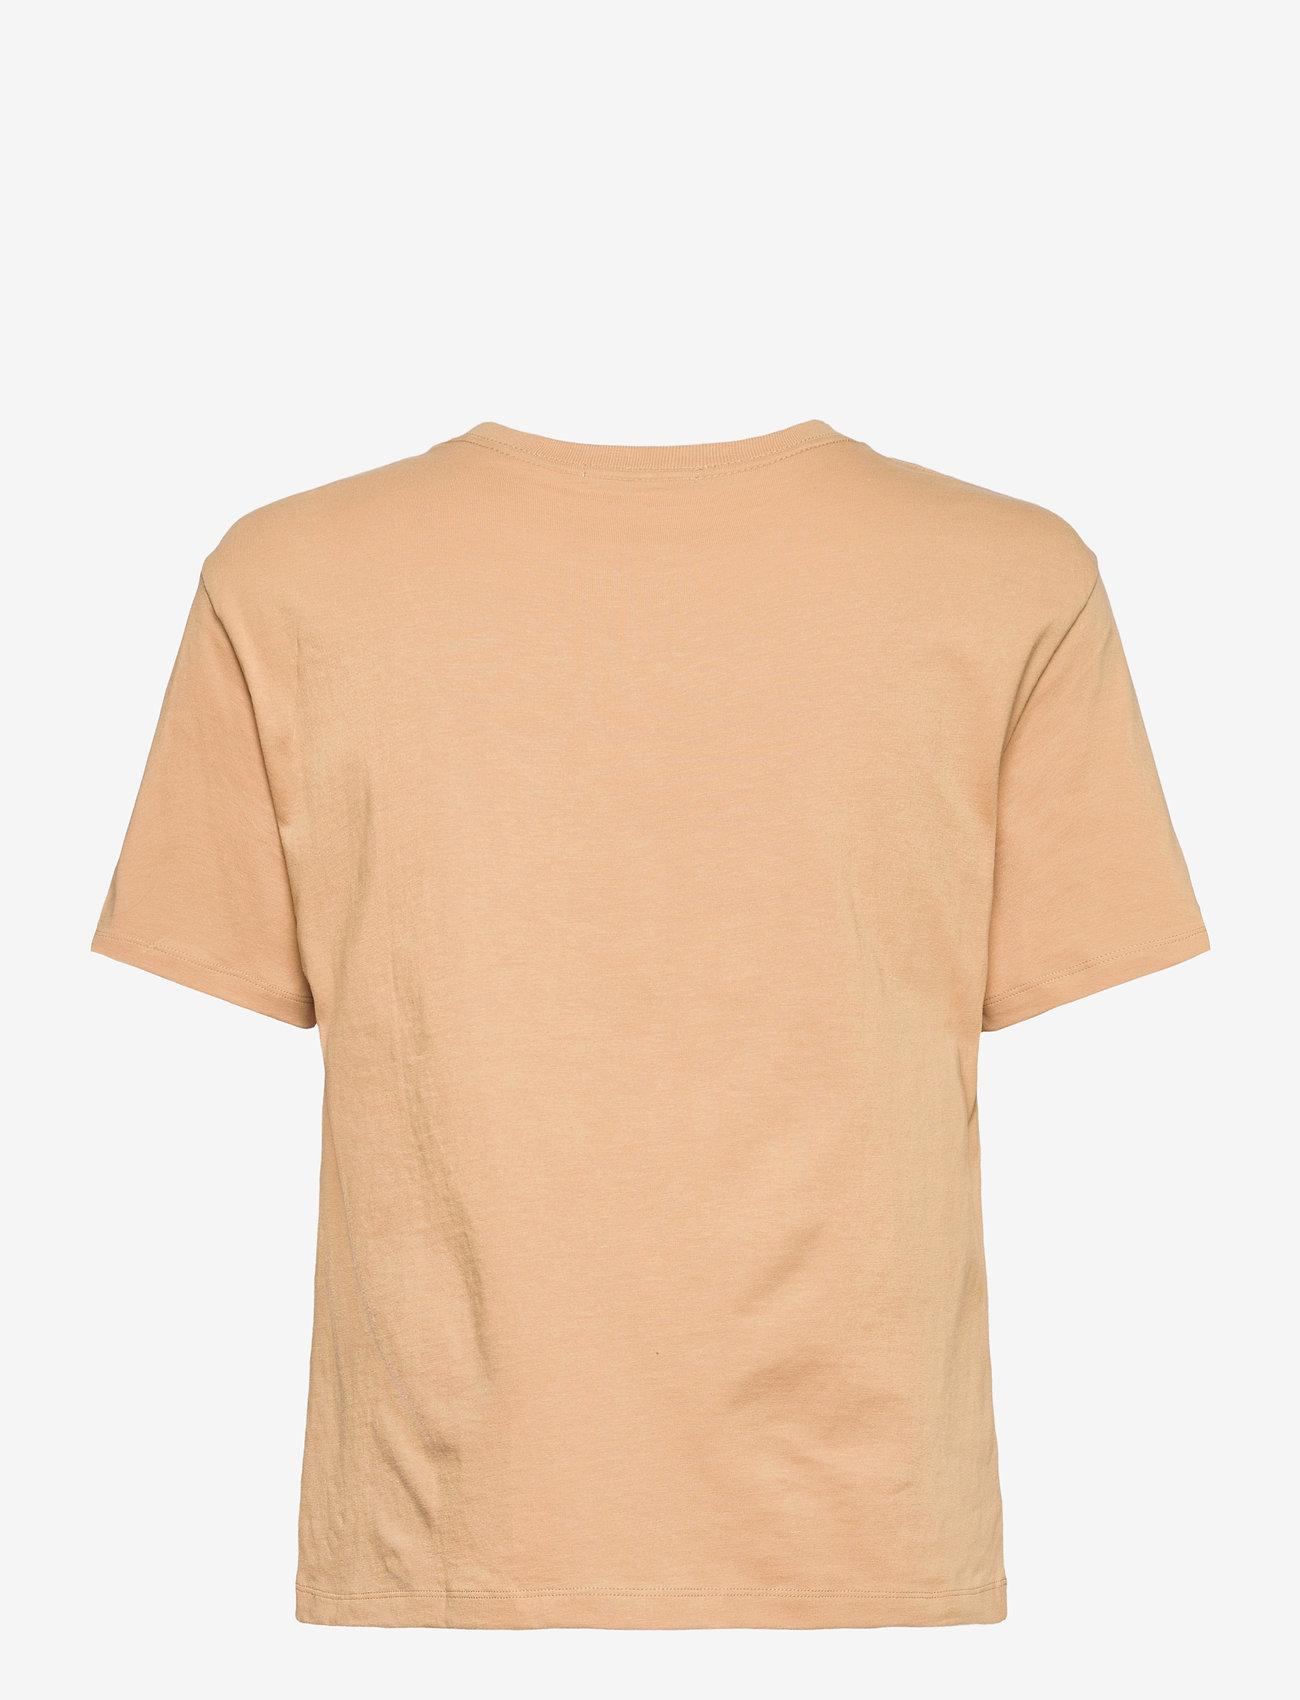 Bread & Boxers - T-shirt Classic - t-shirts - beige - 1